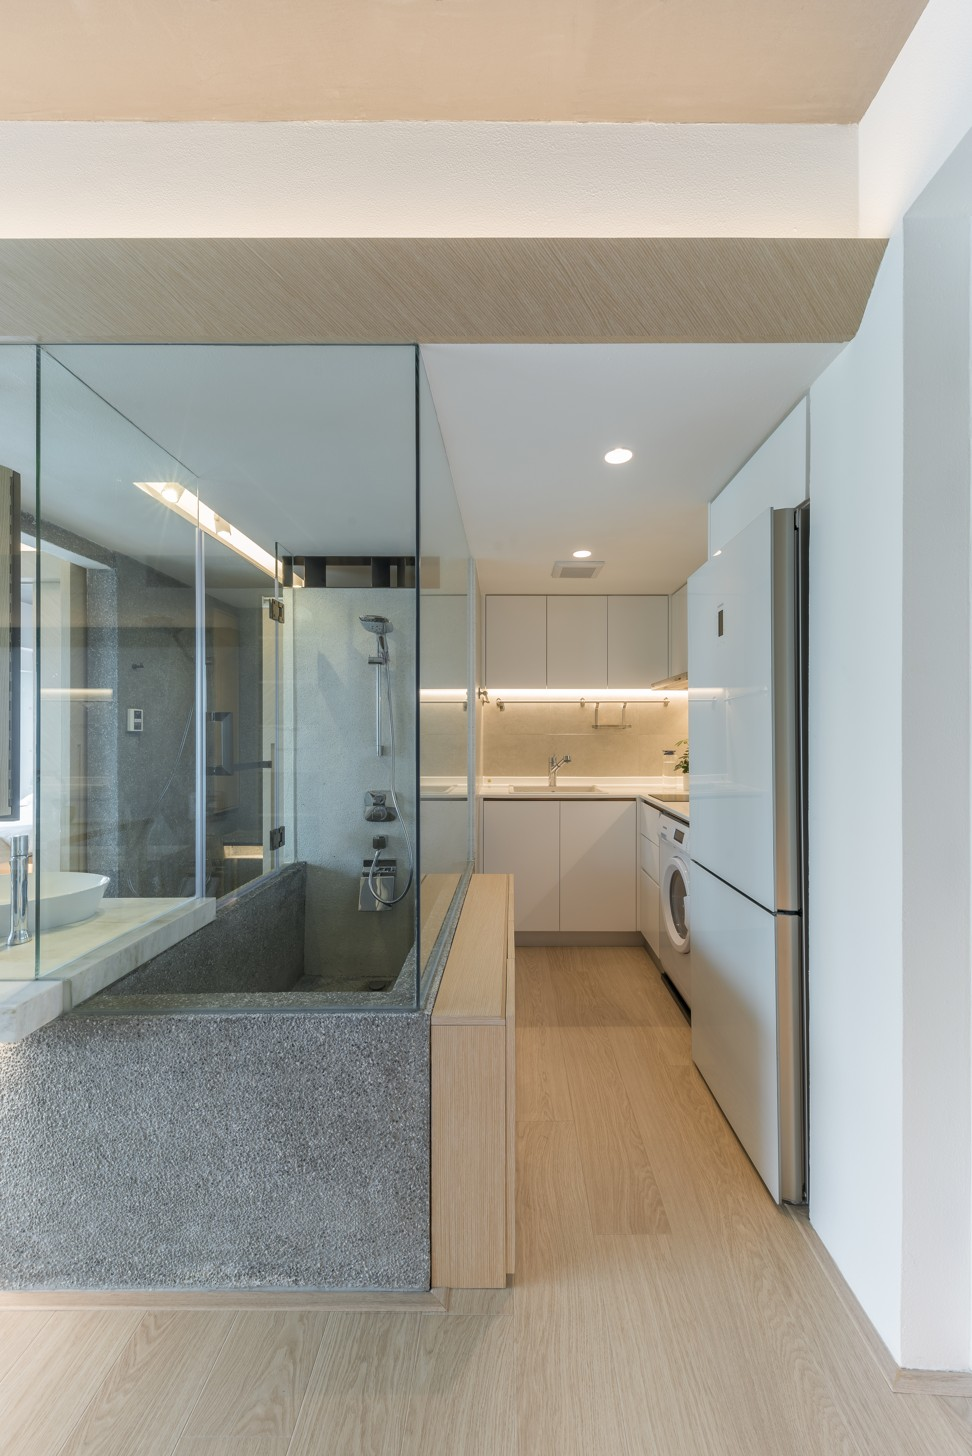 Hong Kong Extreme Makeover Has Glass Wall Bathroom As Flat